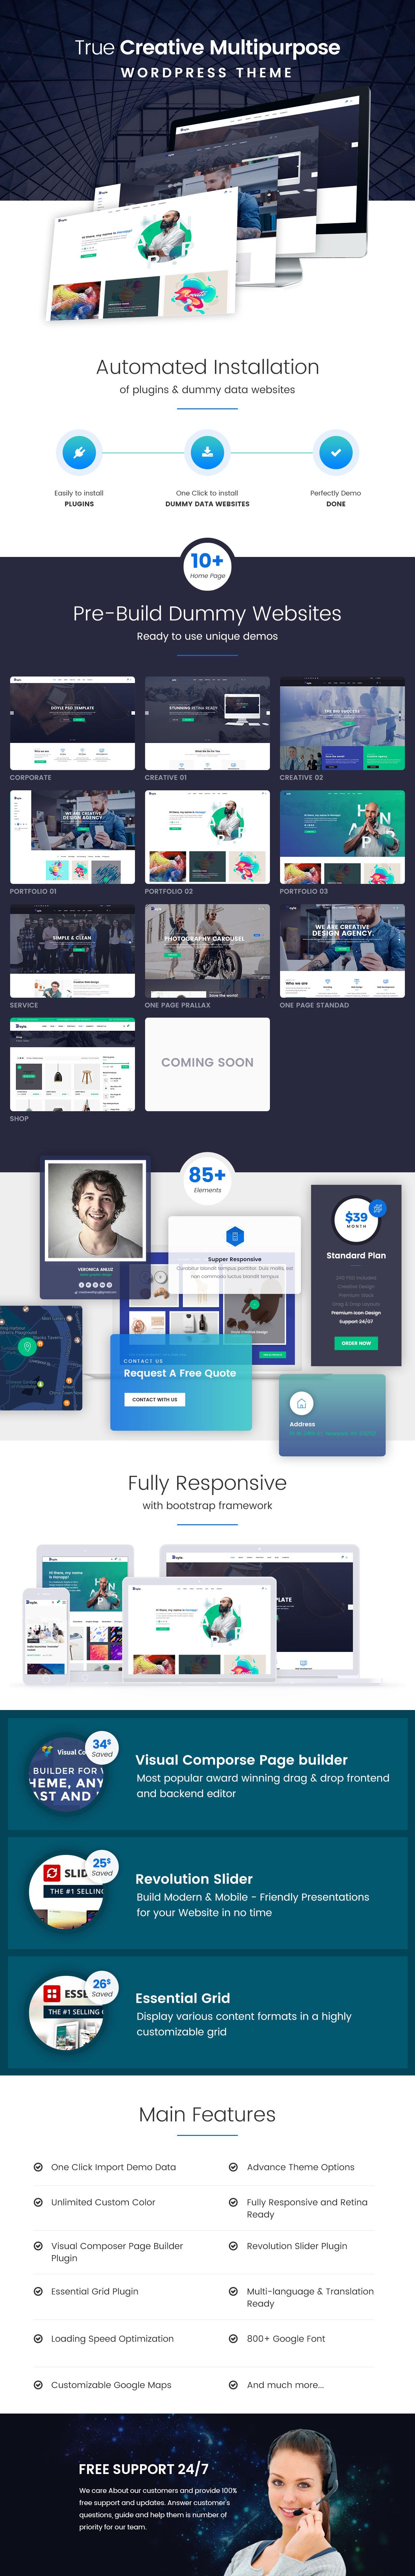 Doyle - Creative Multipurpose WordPress Theme - 2